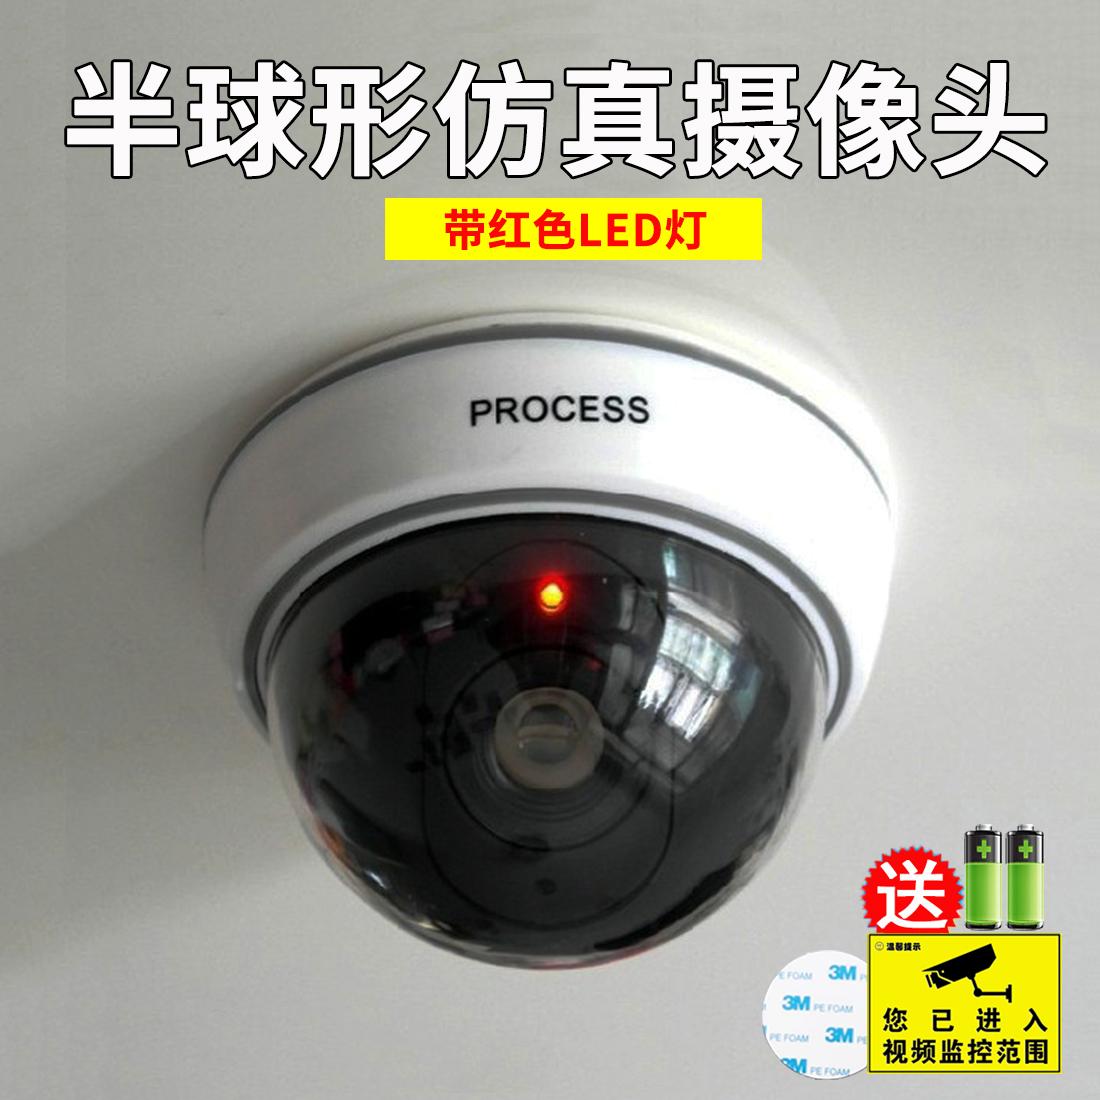 Веб-камеры Артикул 576260188589